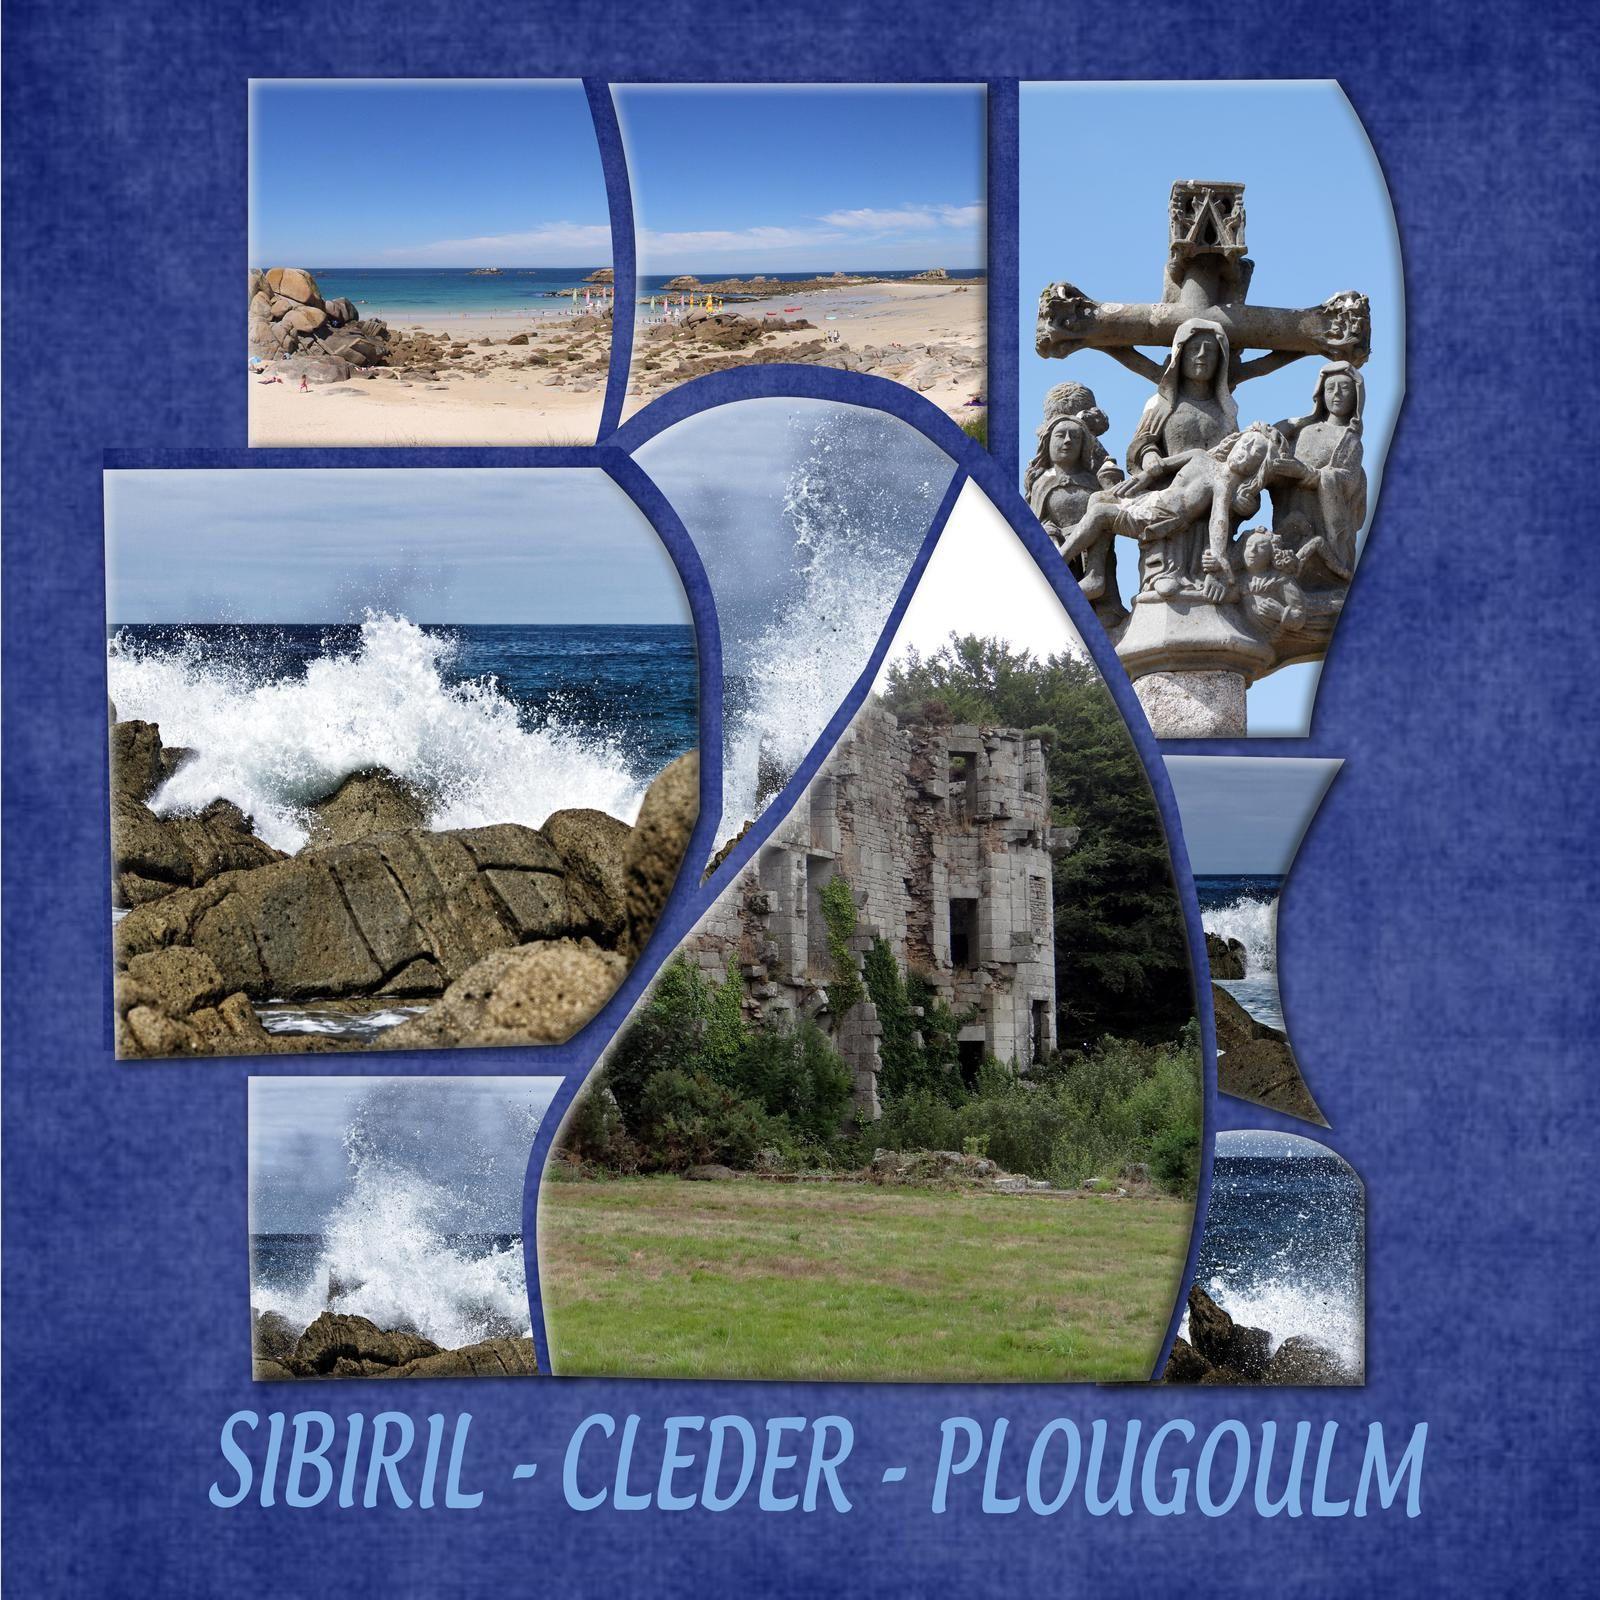 PLOUGOULM - SIBIRIL - CLEDER